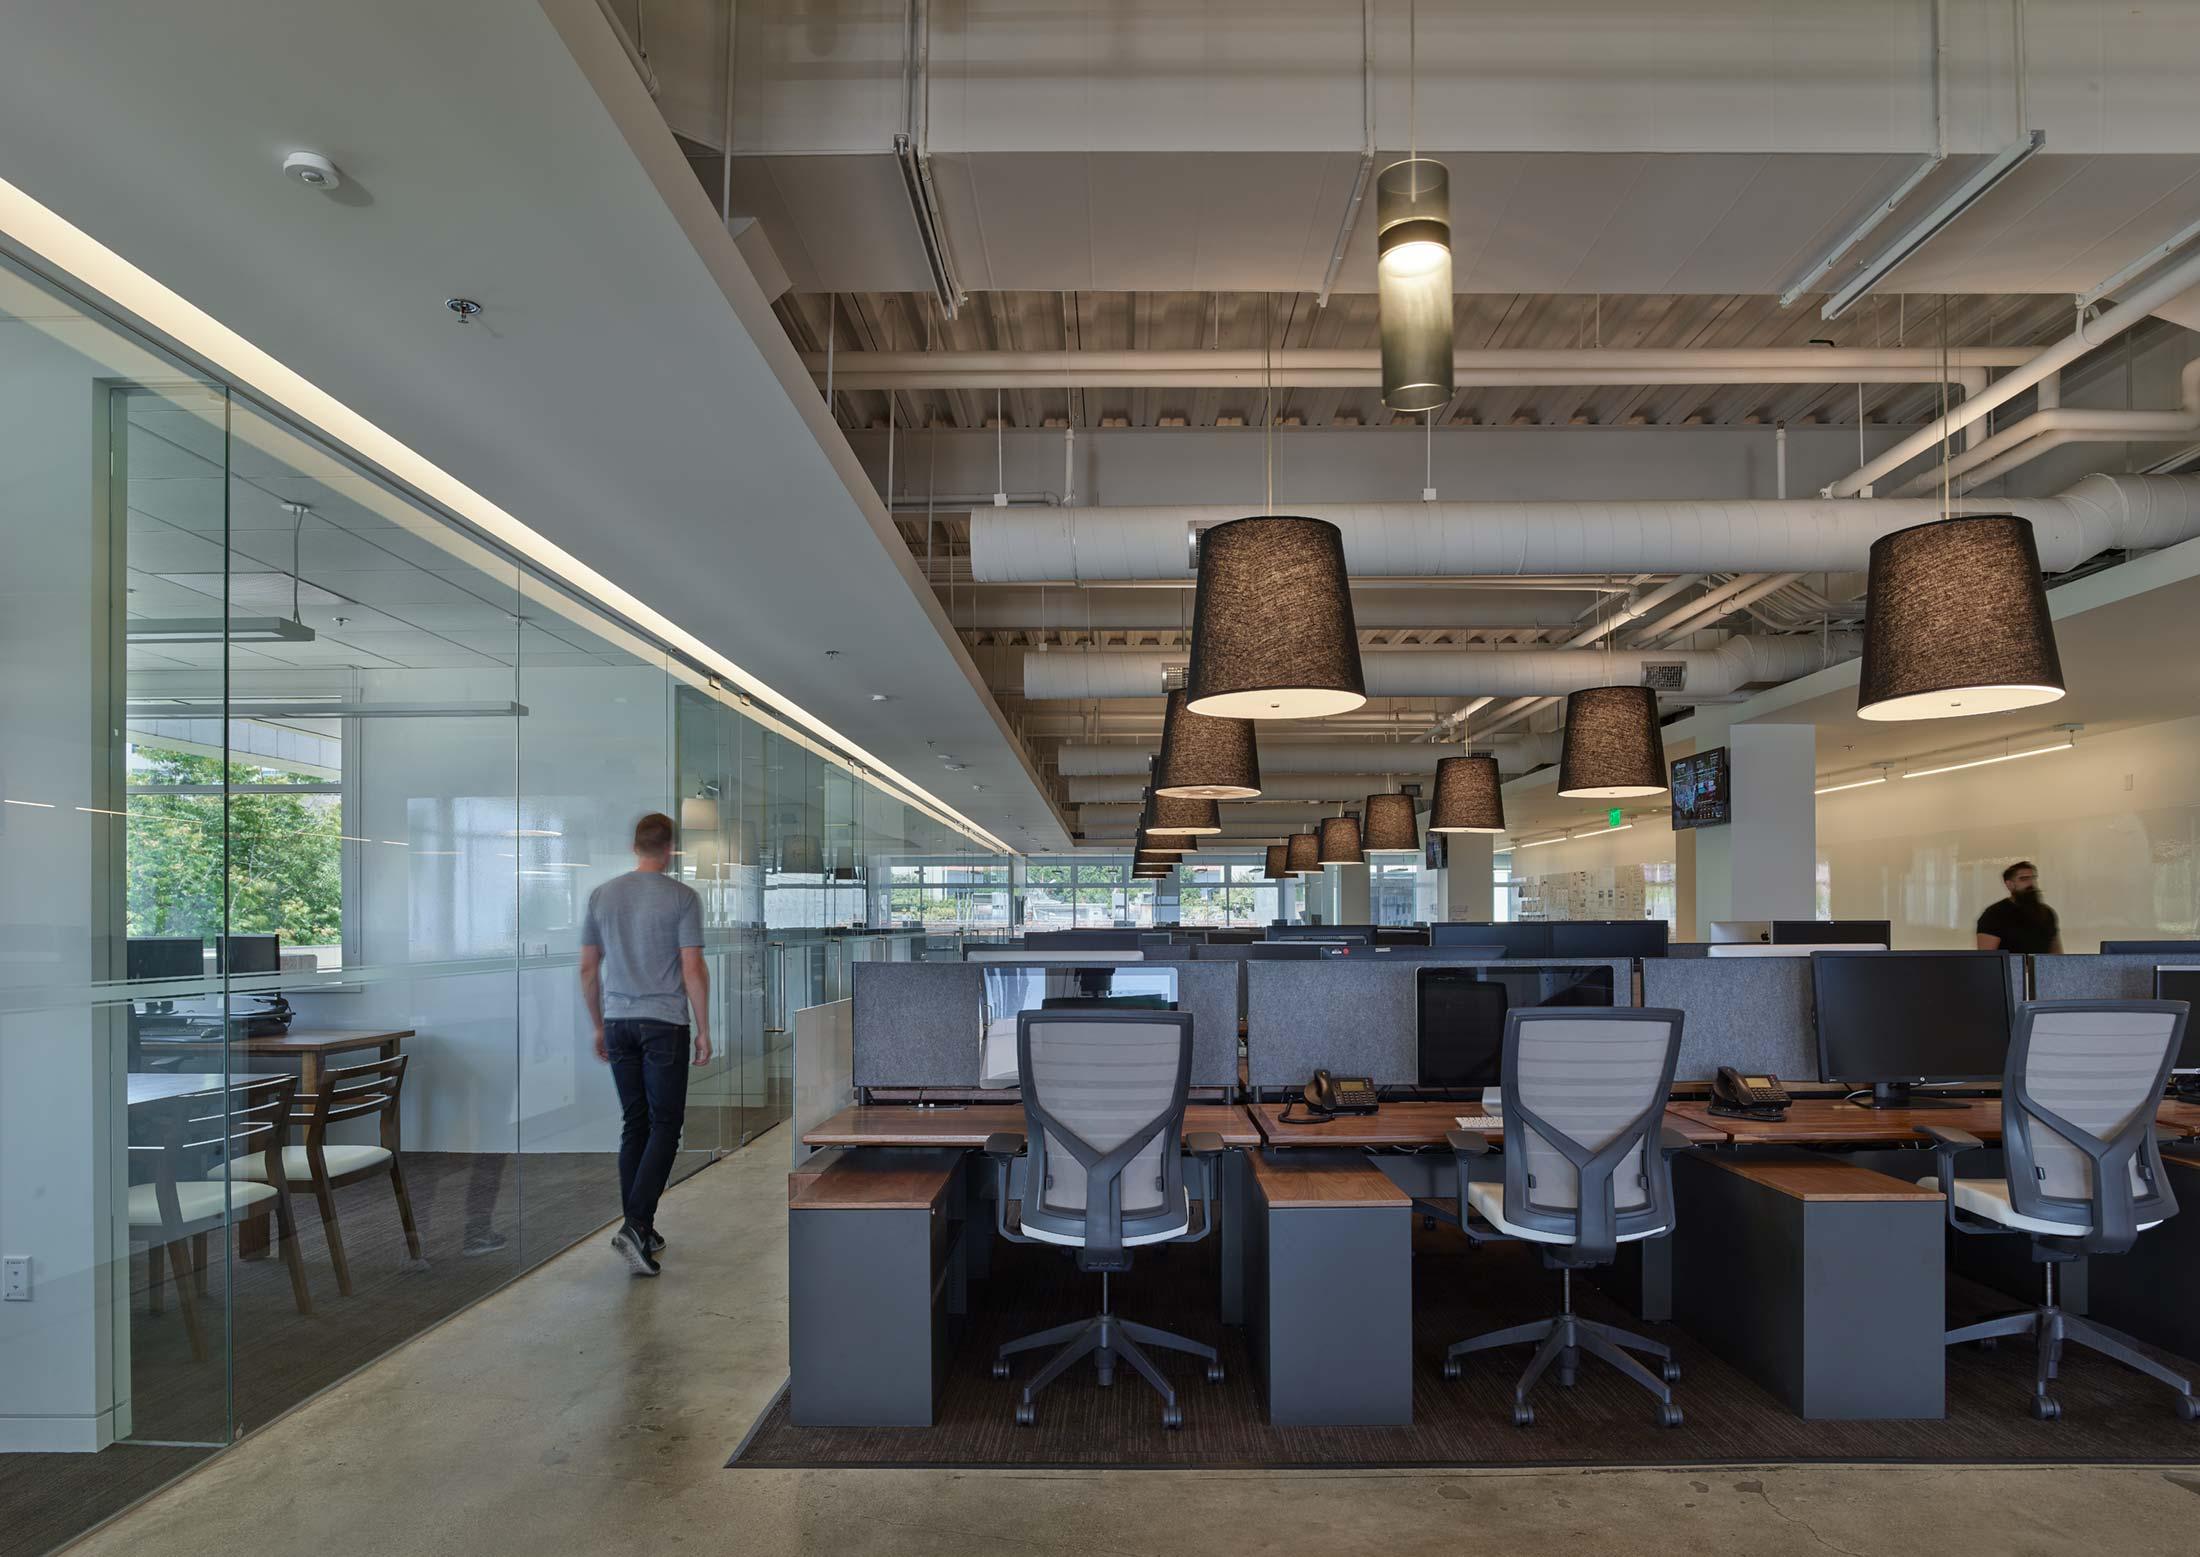 modern-architecture-commercial-interiors-office-california-shubindonaldson-truecar-ocean-02